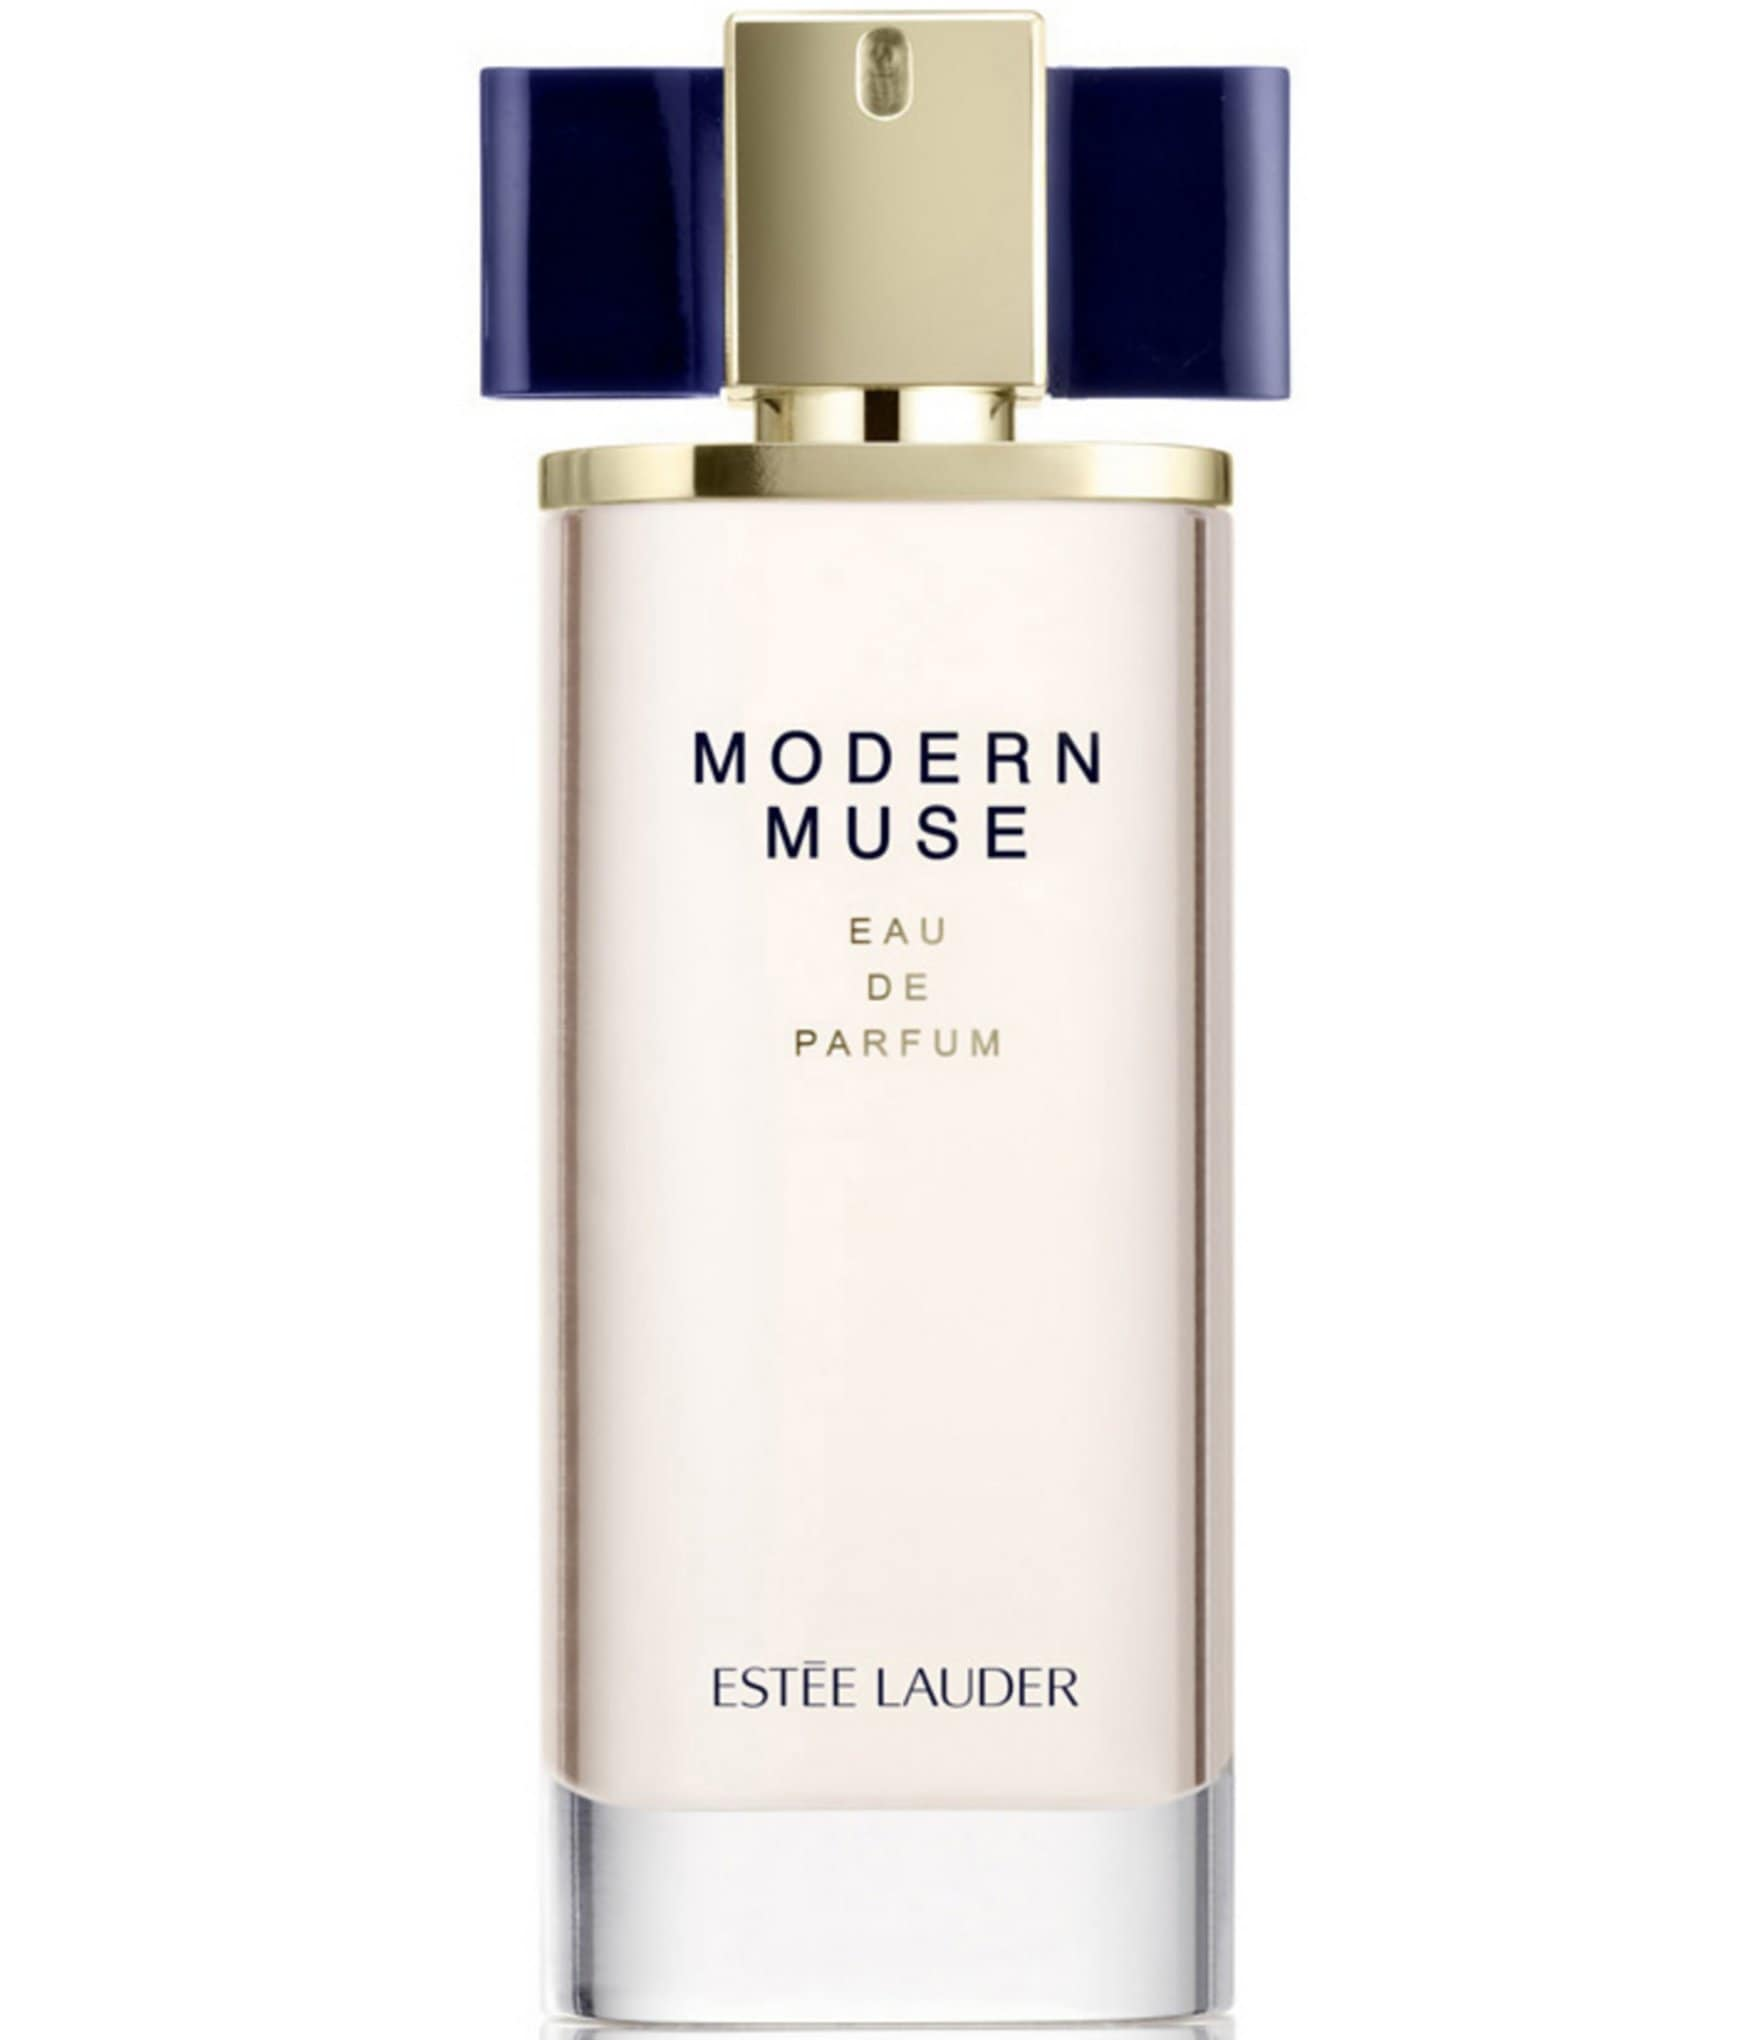 est e lauder modern muse eau de parfum spray dillards. Black Bedroom Furniture Sets. Home Design Ideas